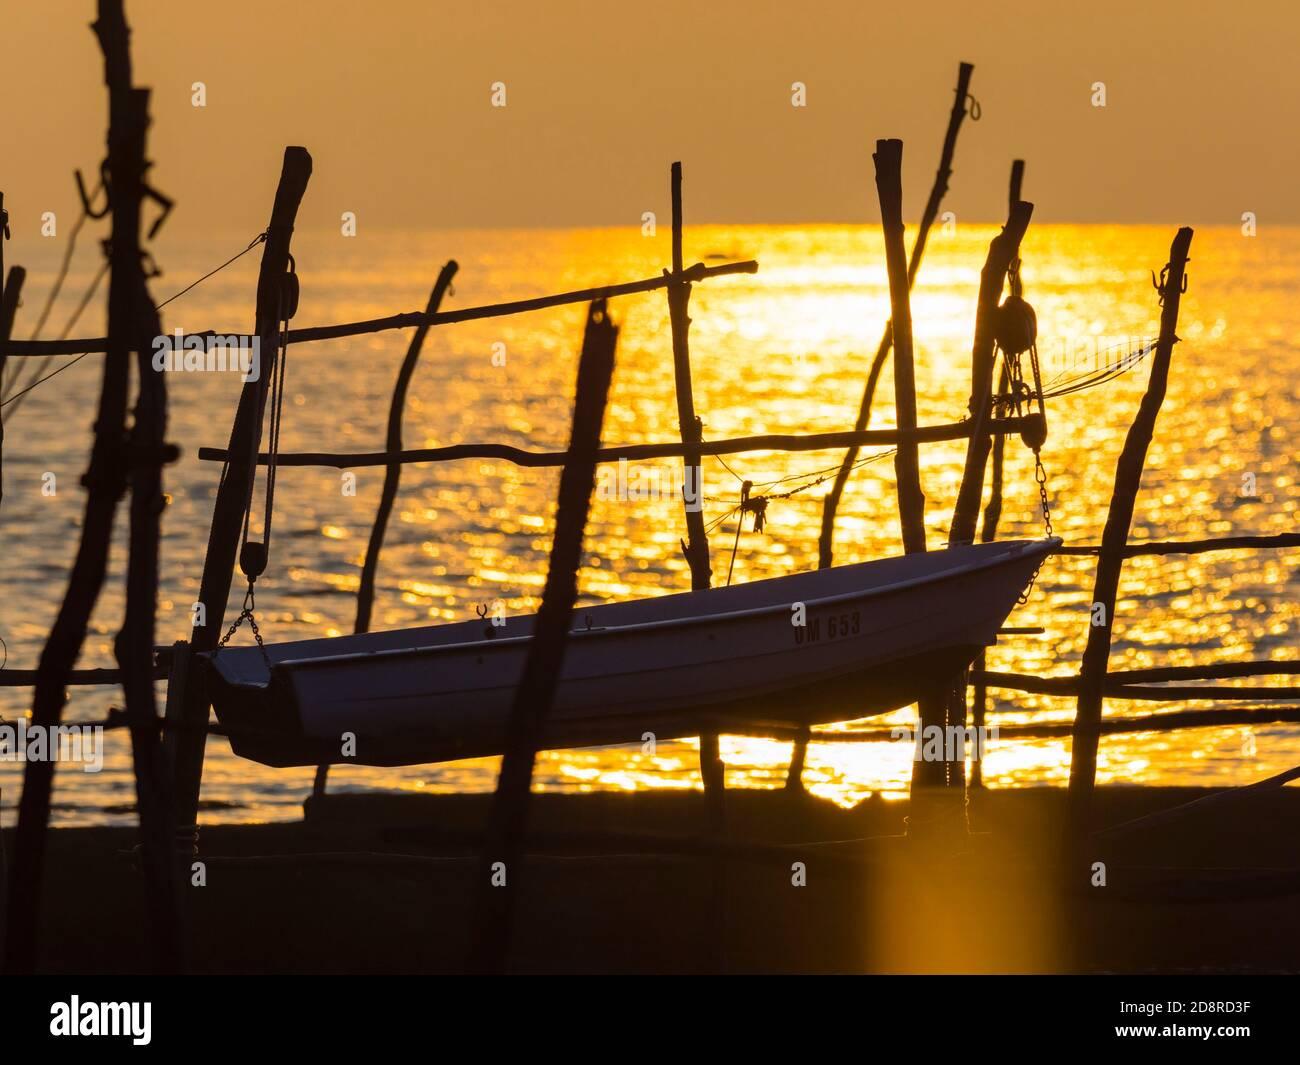 Intensive vivid sunset setting sun Yellow featuring hanging silhouette boat o wooden posts Basanija near Savudrija, Istria Coast in Croatia Europe Stock Photo